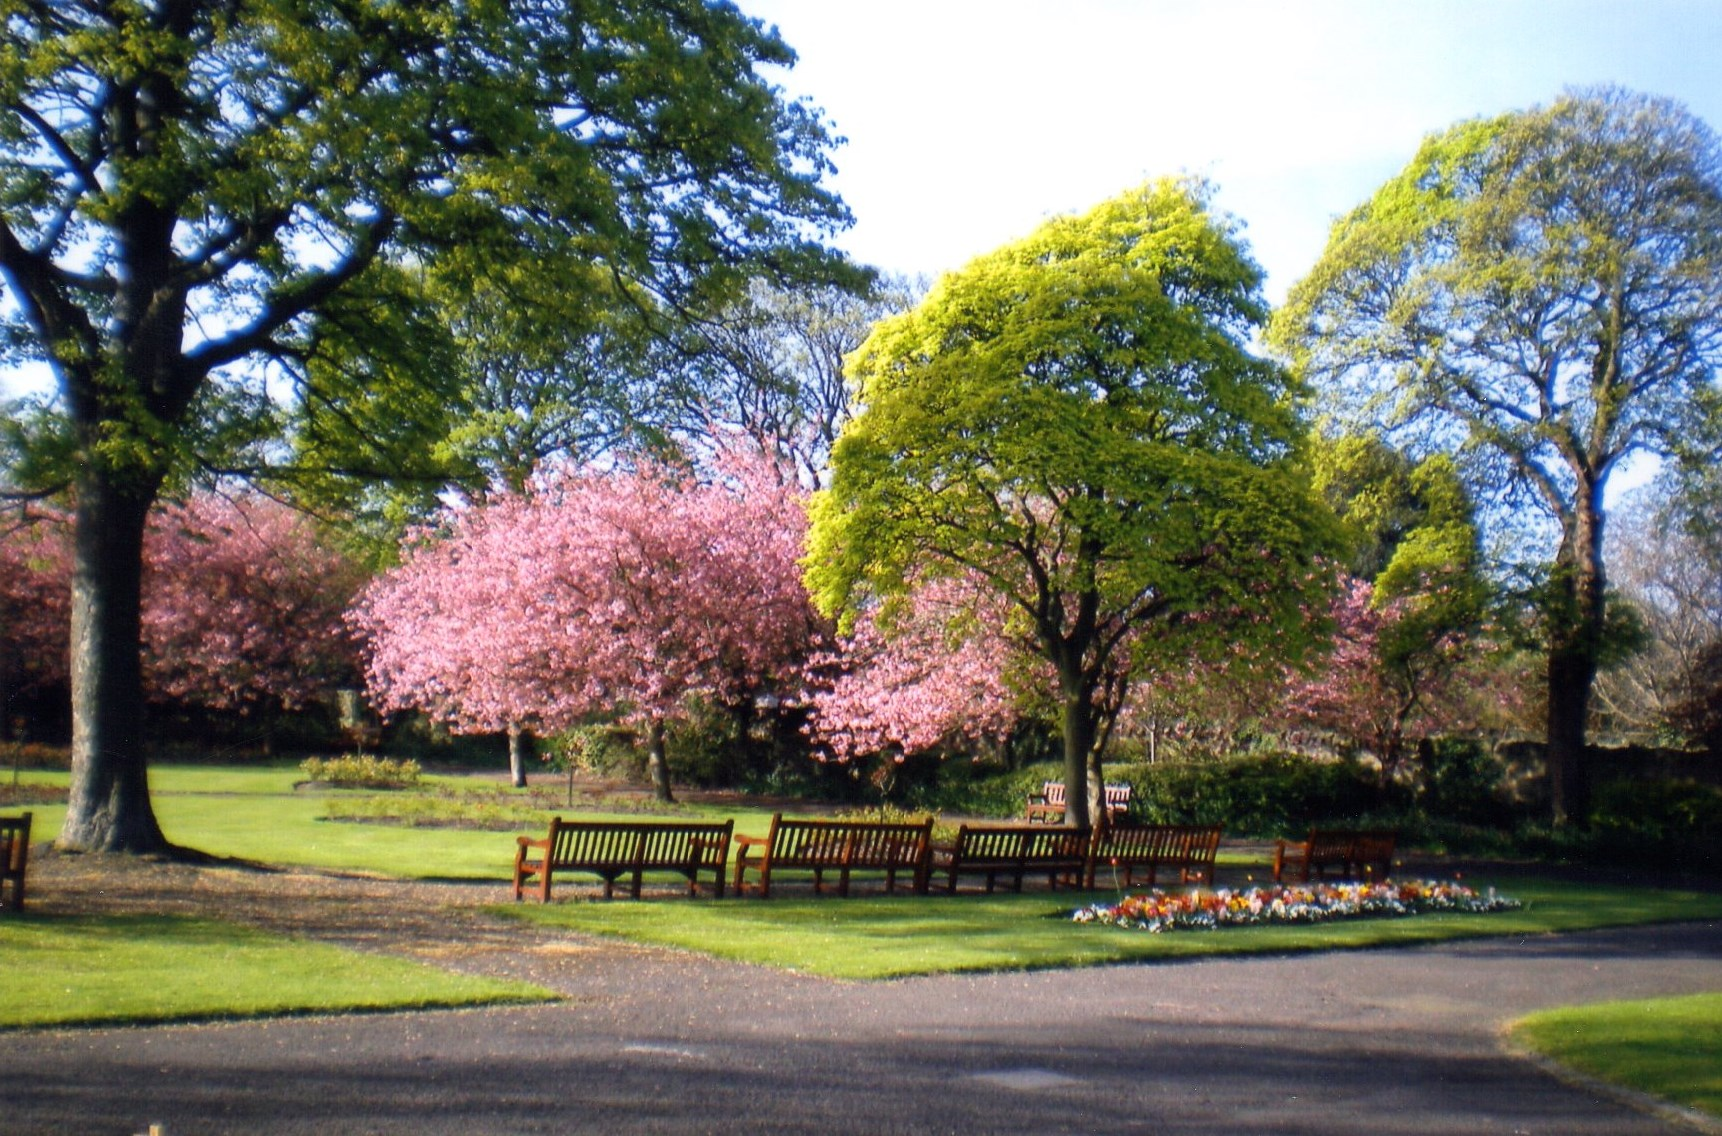 The Duke and Duchess of Cambridge visited Starbank Park in Ednburgh